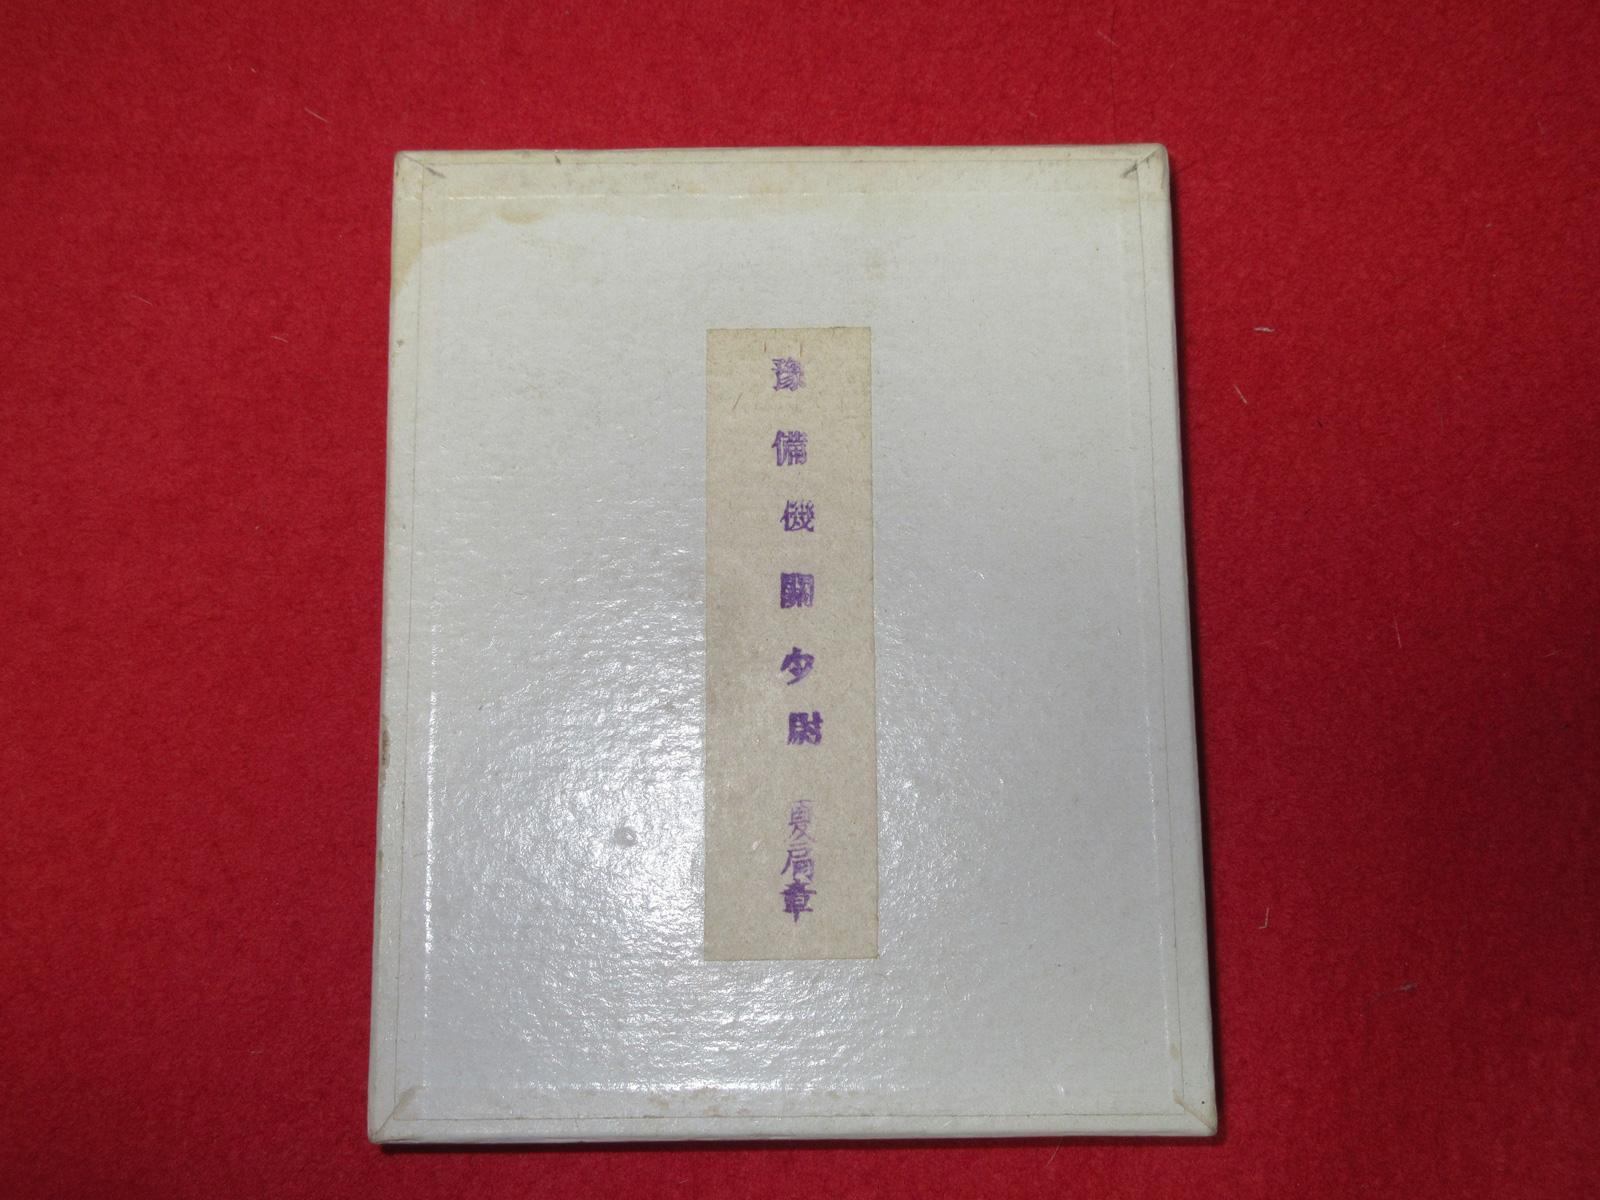 rank_insignia-0041